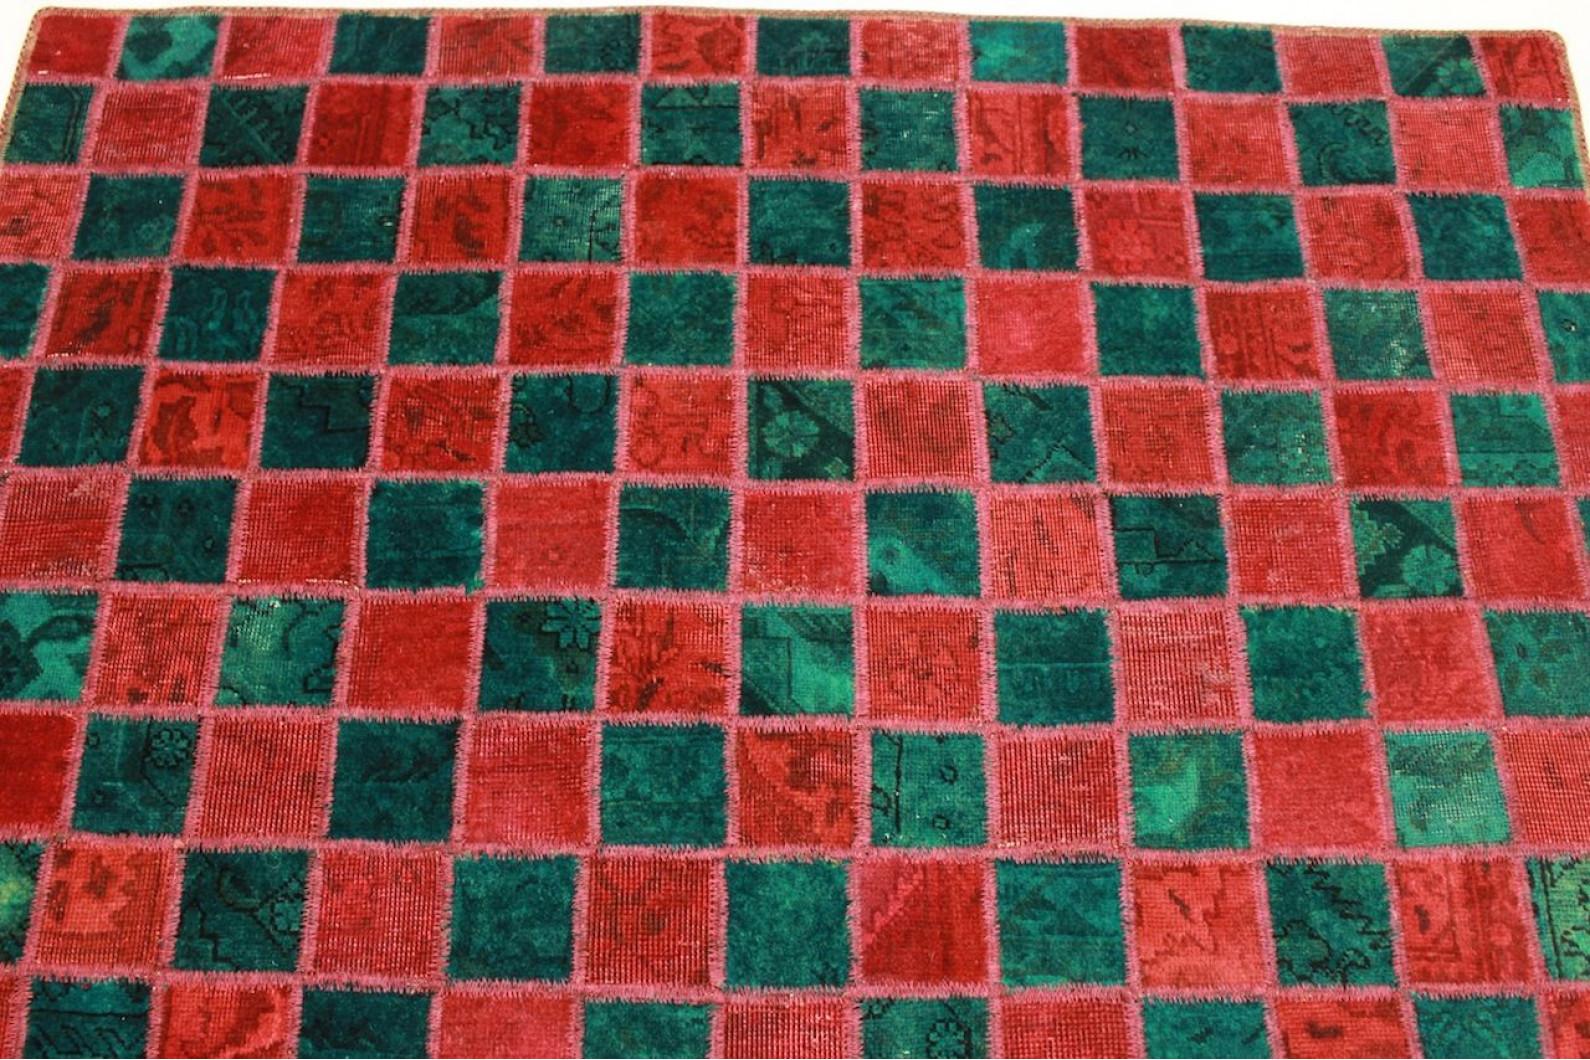 patchwork rug red turquoise in 200x160cm 1001 2313 buy online at. Black Bedroom Furniture Sets. Home Design Ideas